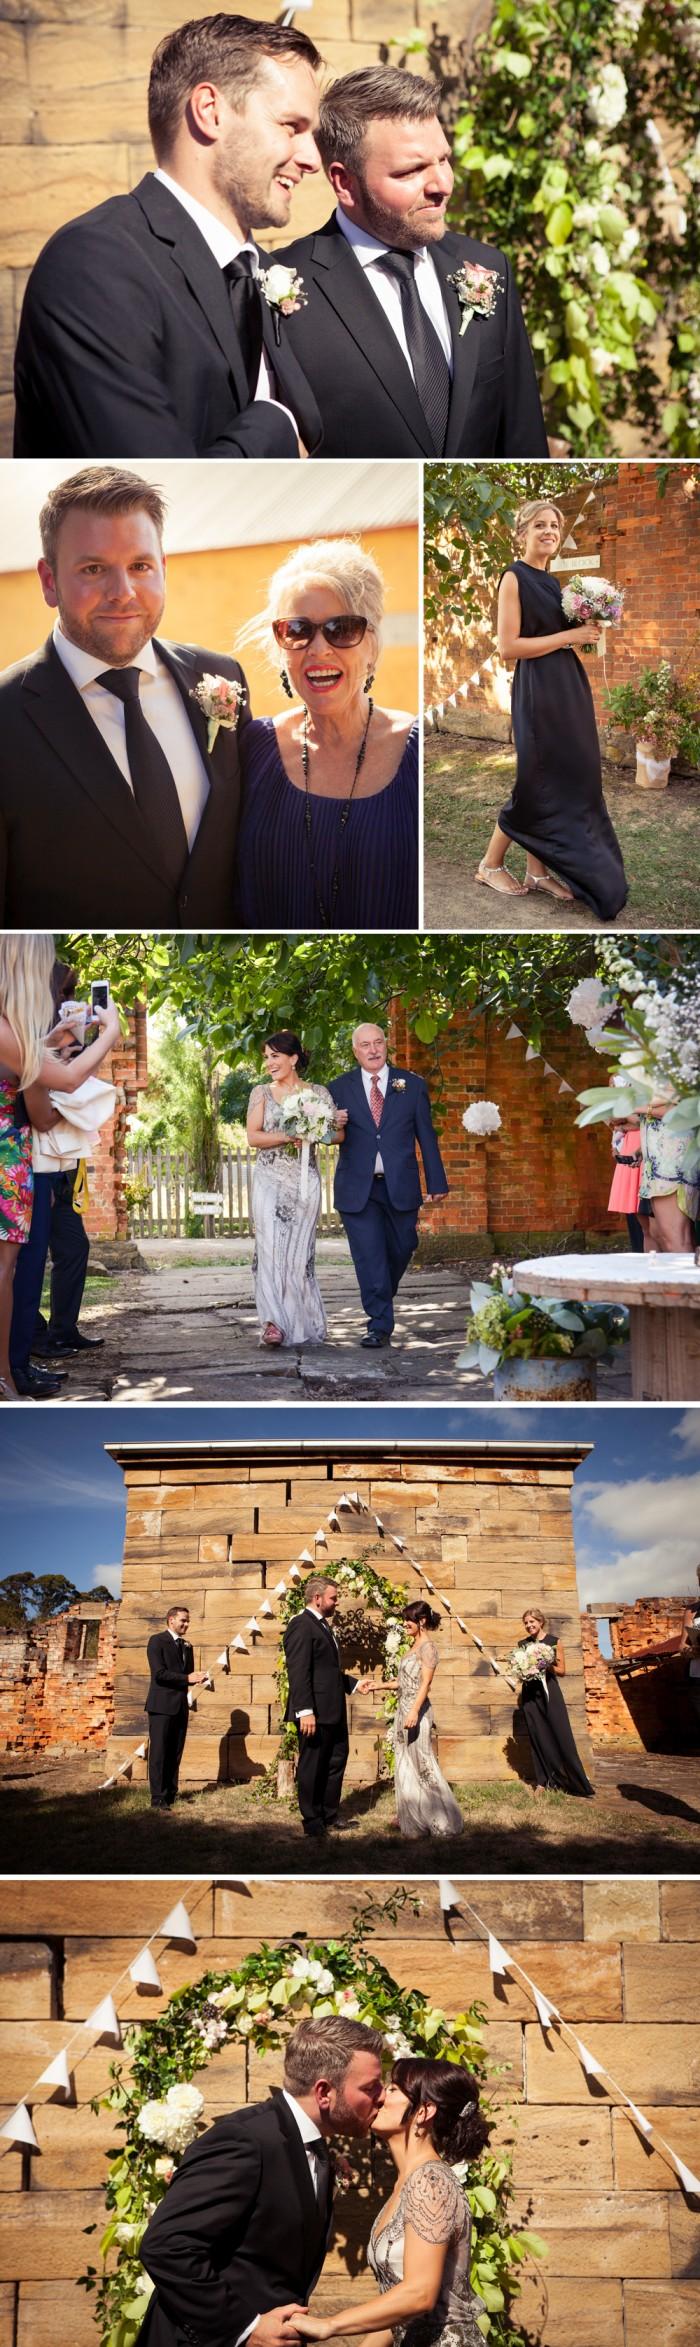 Sebily-Wedding-for-web-4